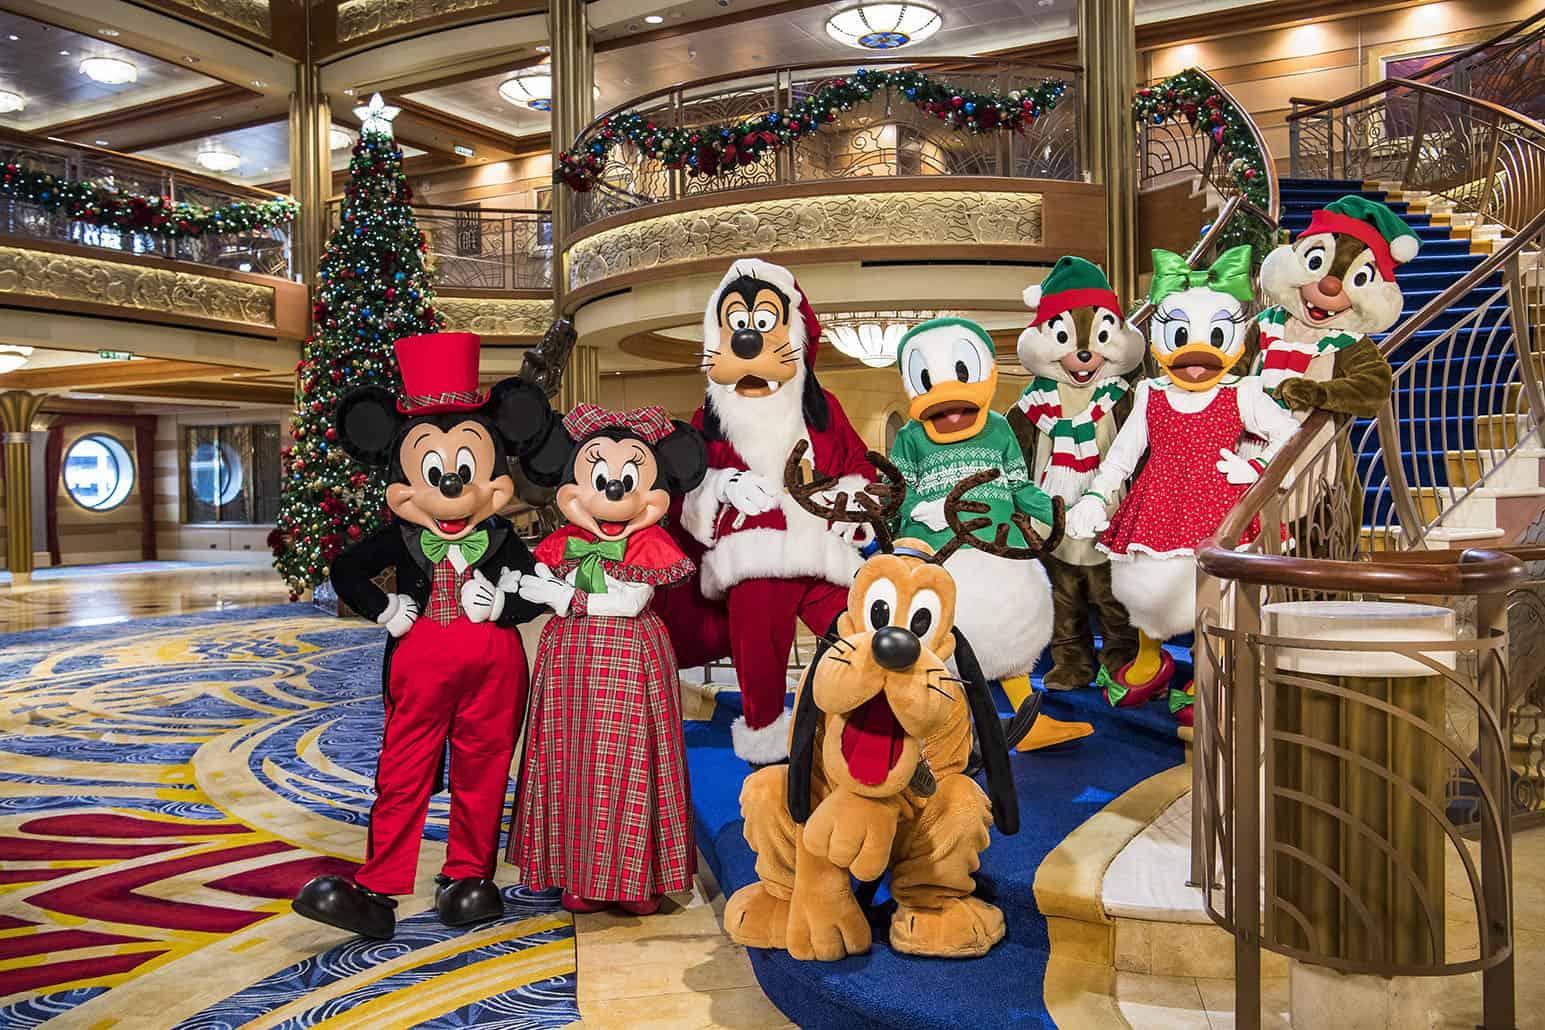 2020 Christmas Cruise MiceChat   Disney Cruise Line, News   Disney Cruise Line Awaits